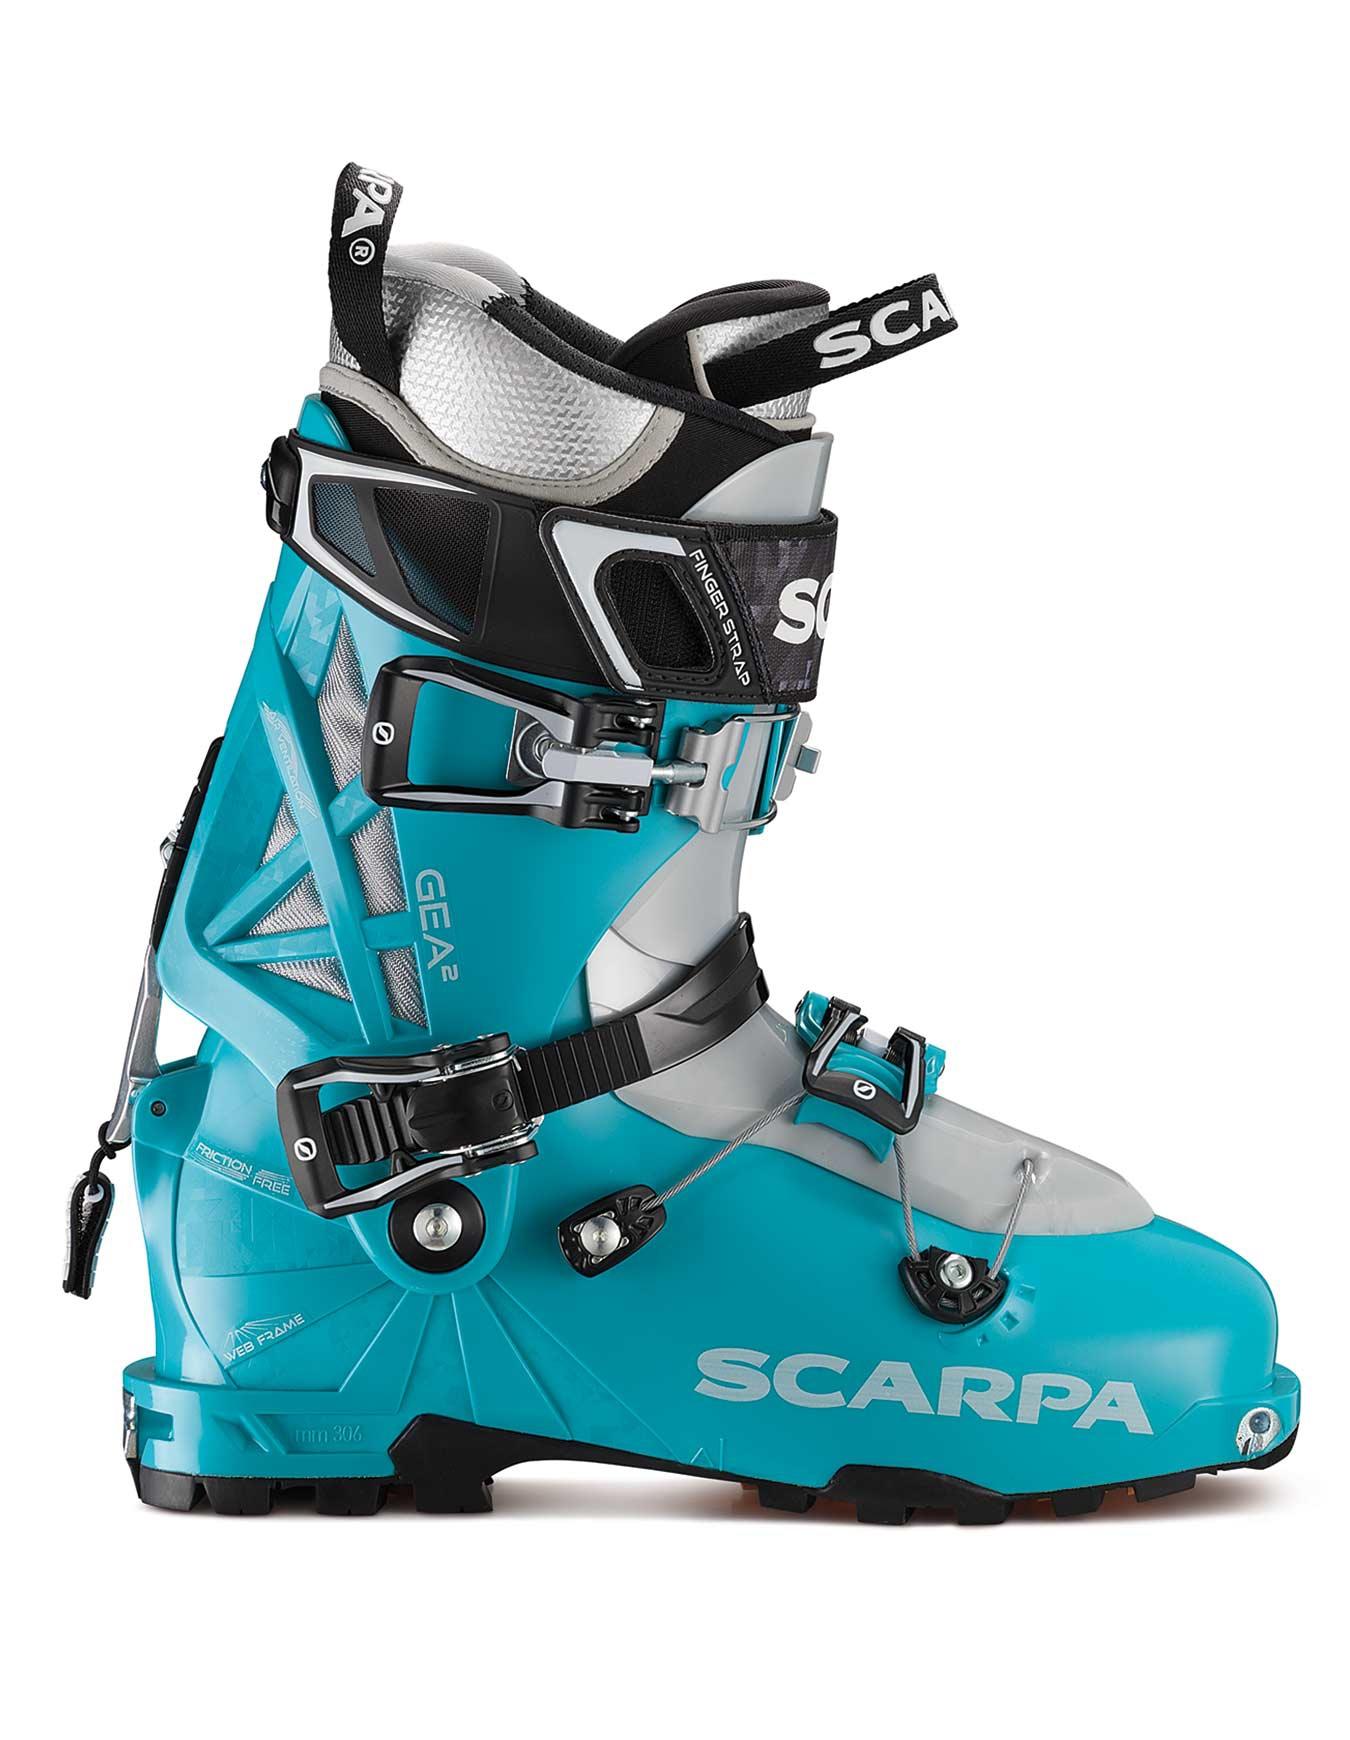 chaussure chaussure ski ski scarpa femme EWIYH2eD9